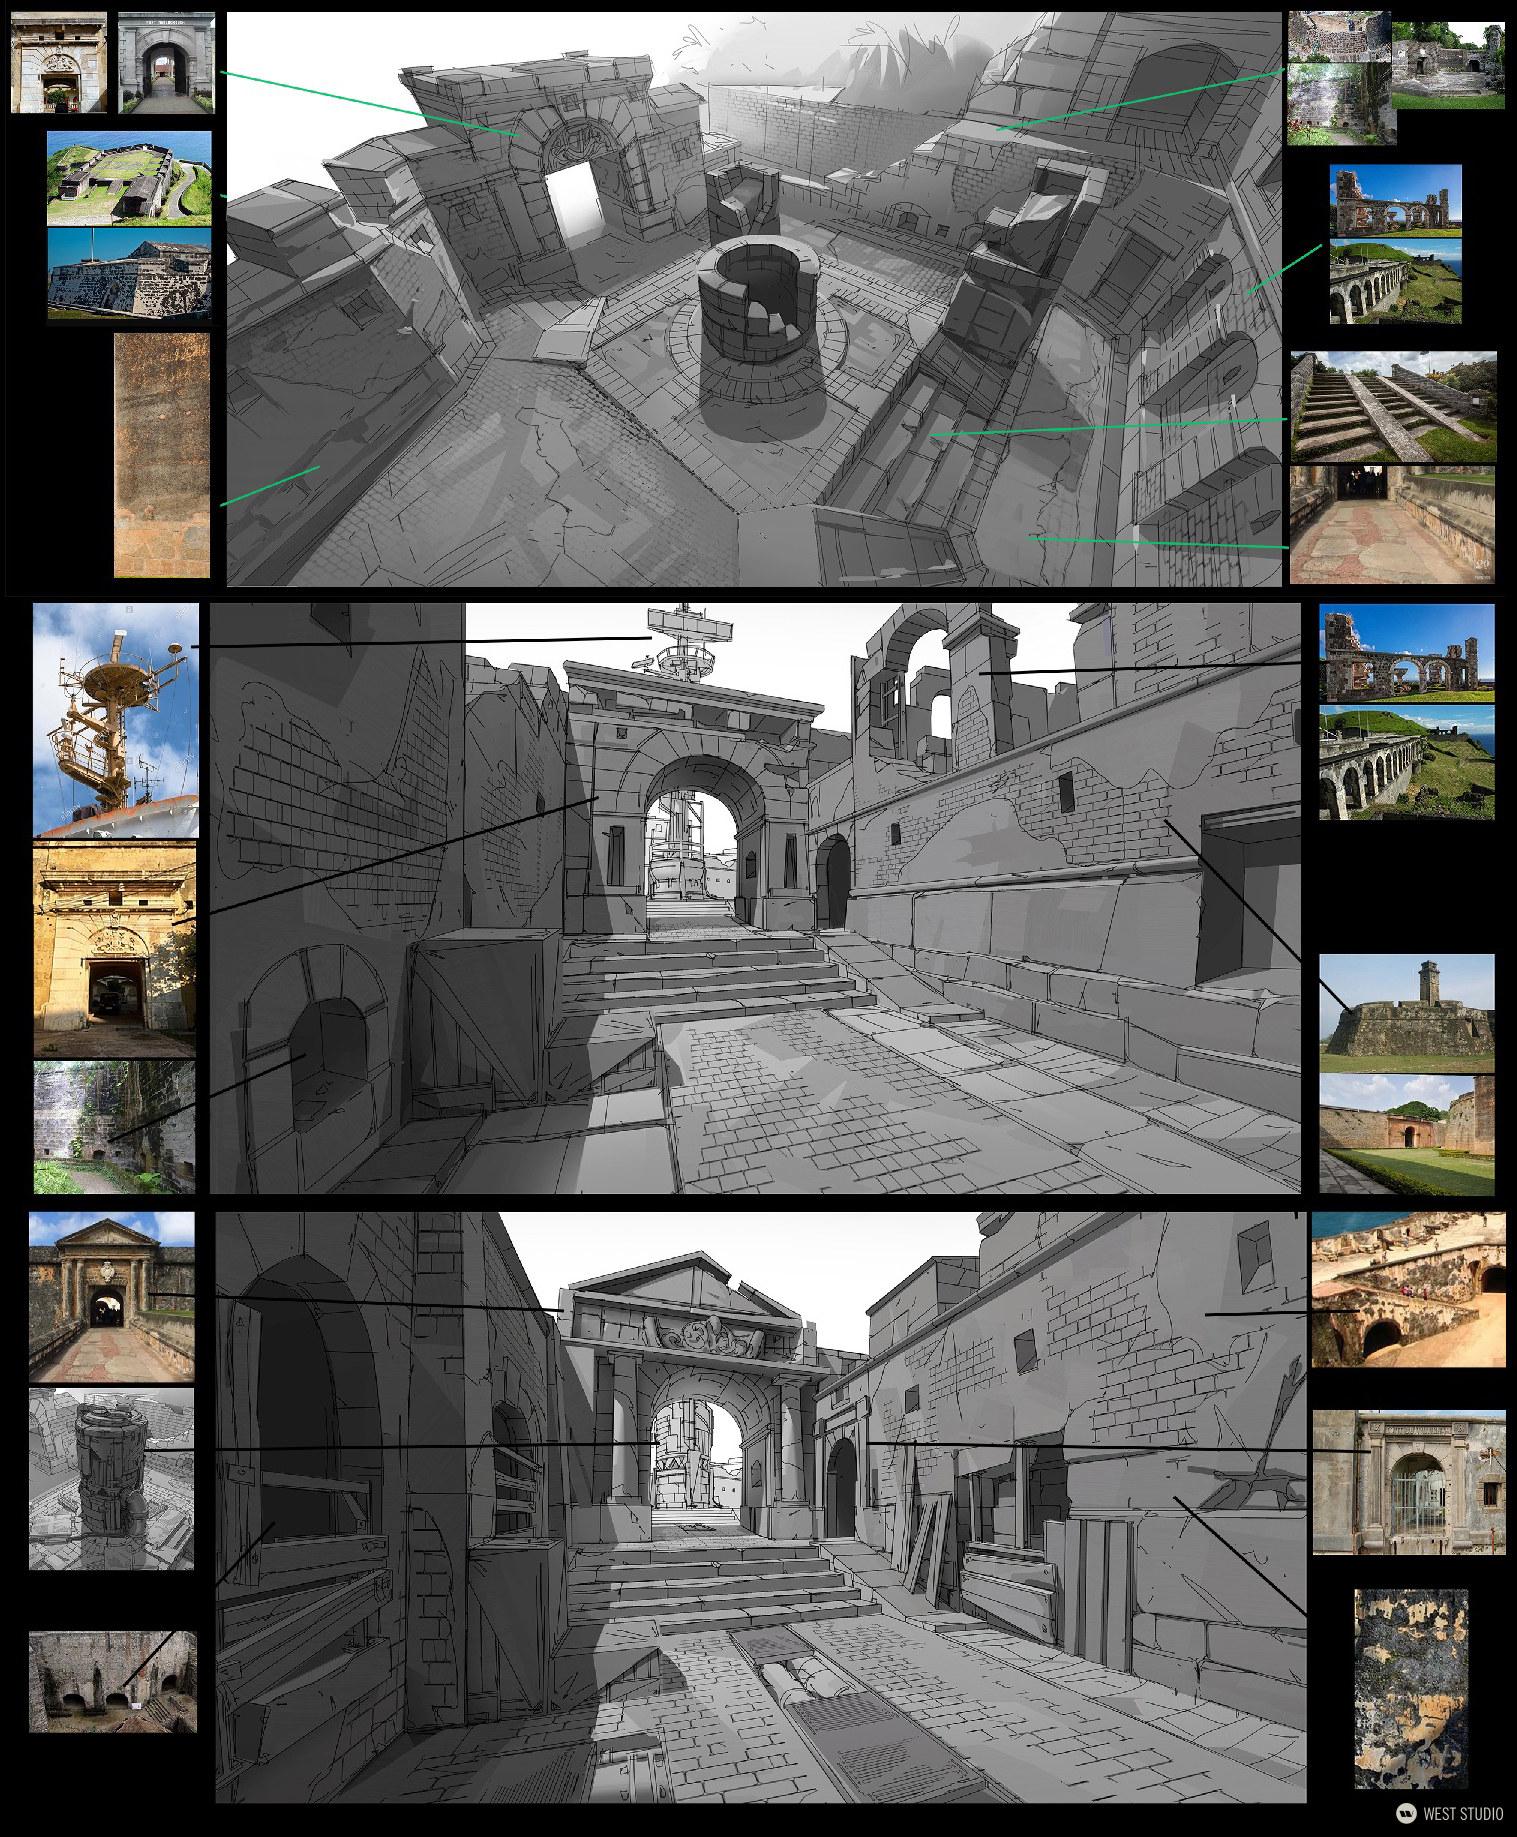 Riot Games, Riot, Valorant, Illustration, Environment Concepts, Concept Art, Game Development, In Game Art, West Studio, Digital Art, Location Design